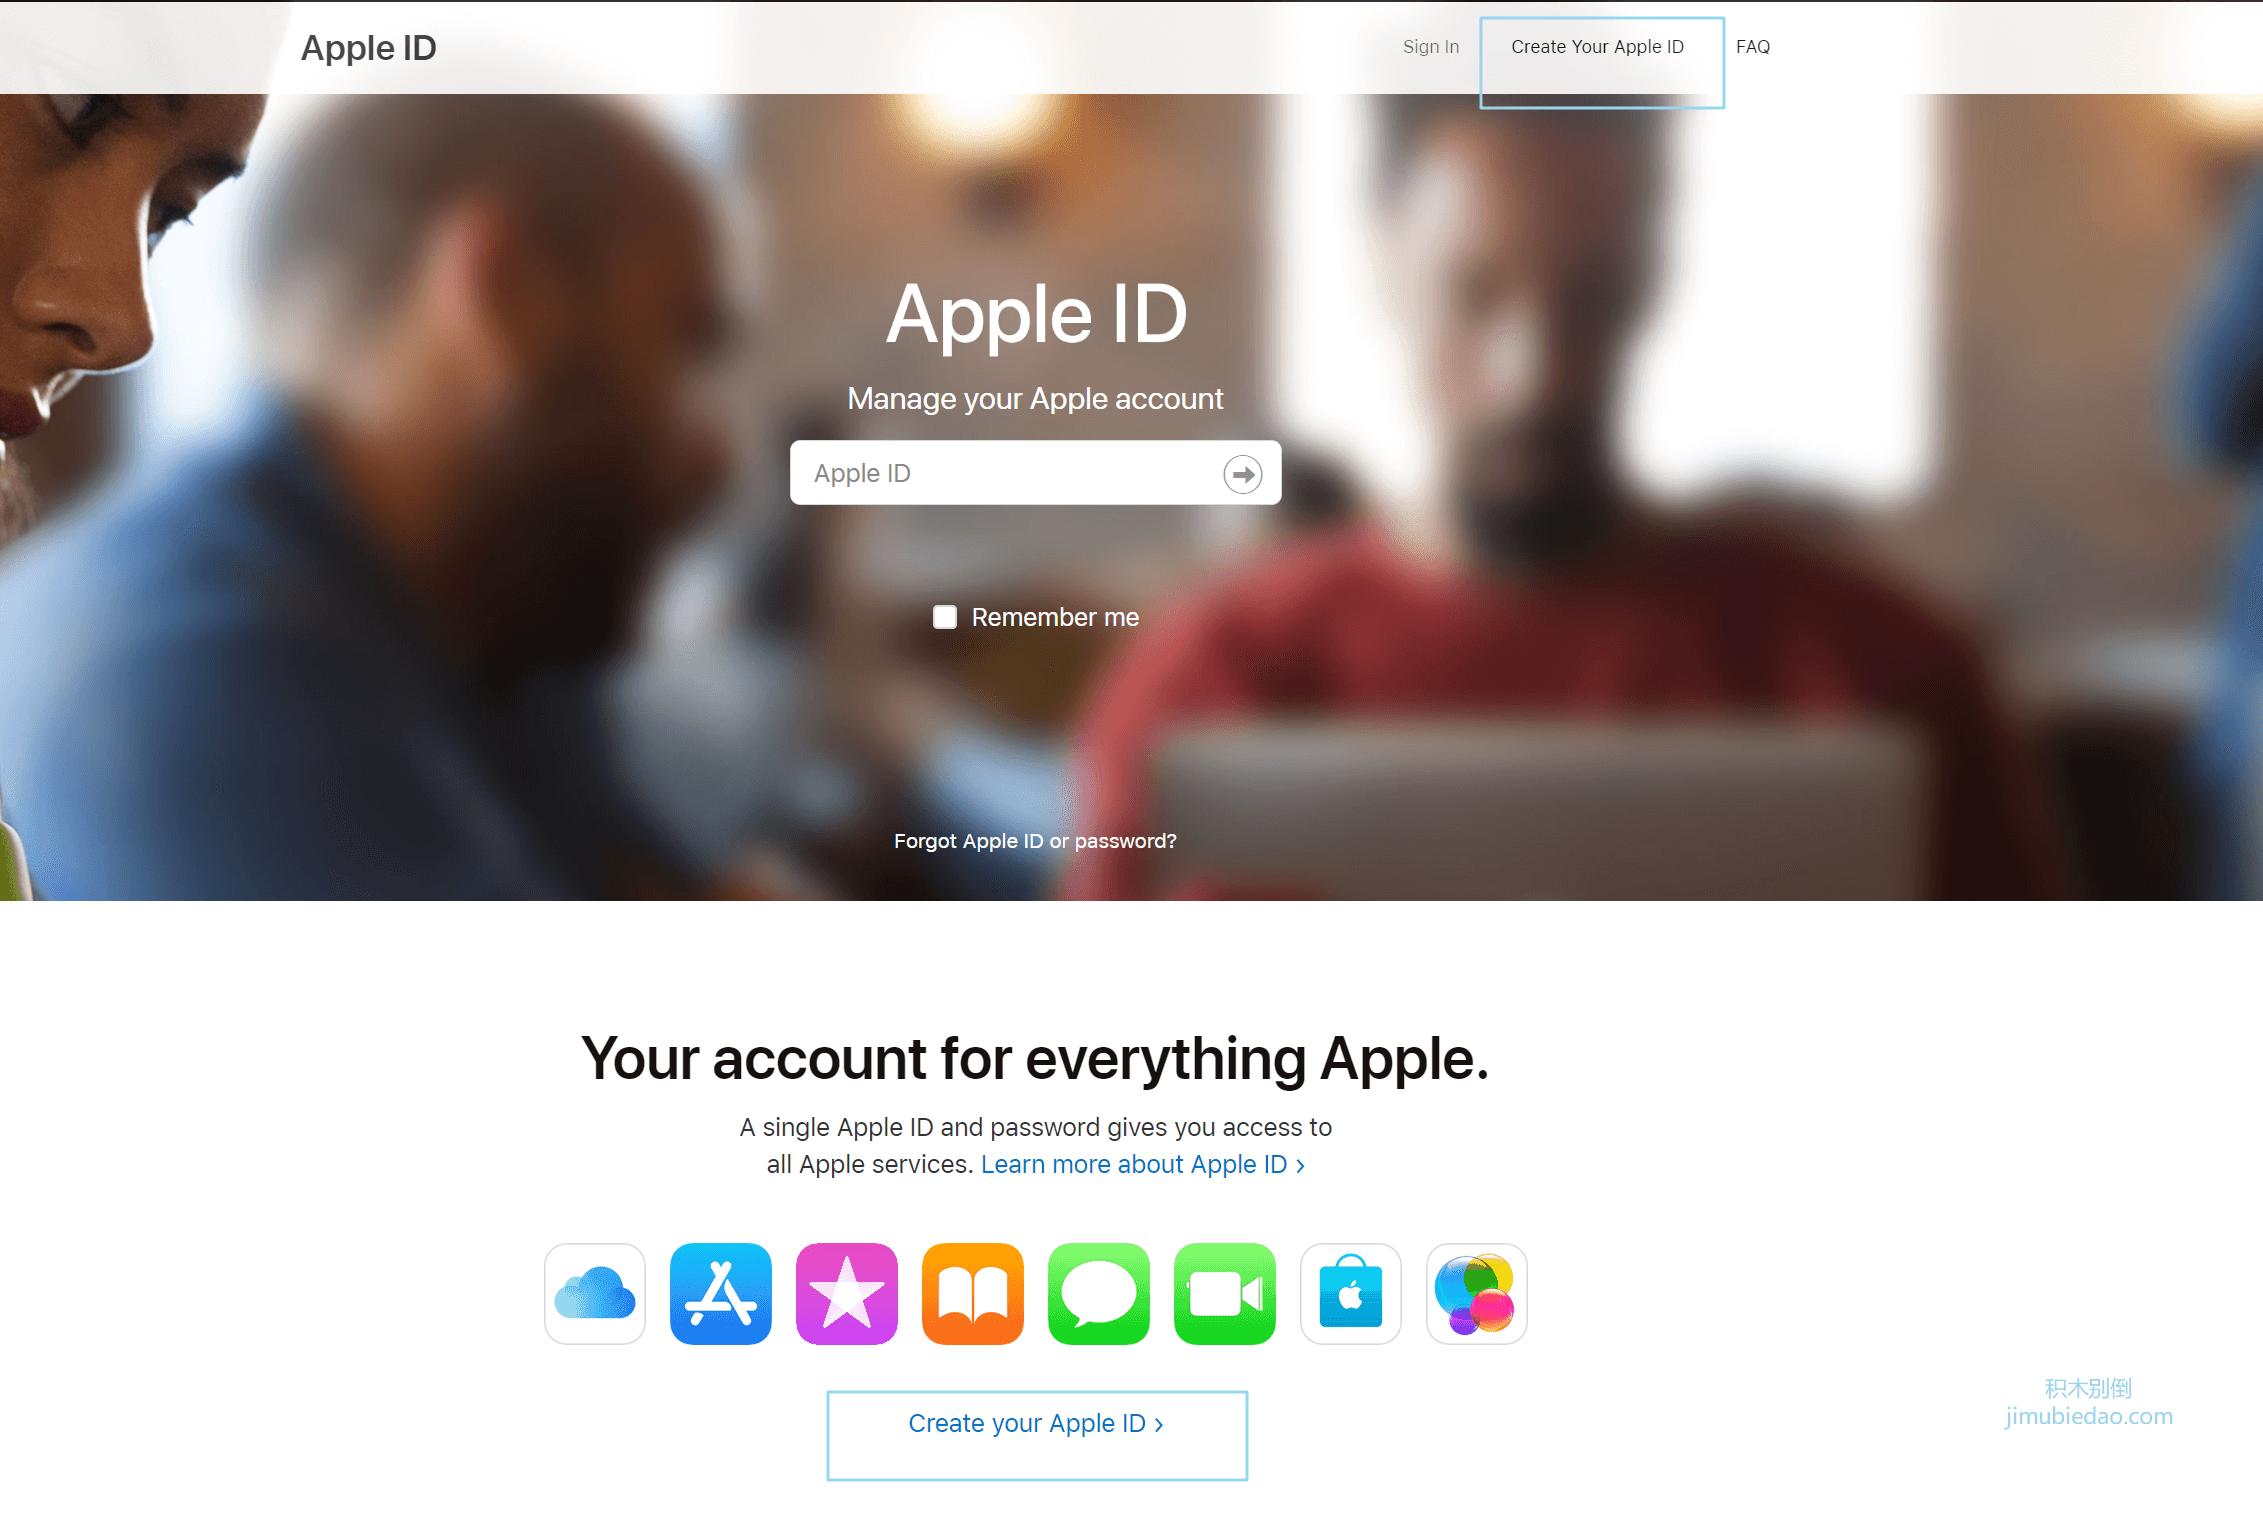 创建美区apple id第一步